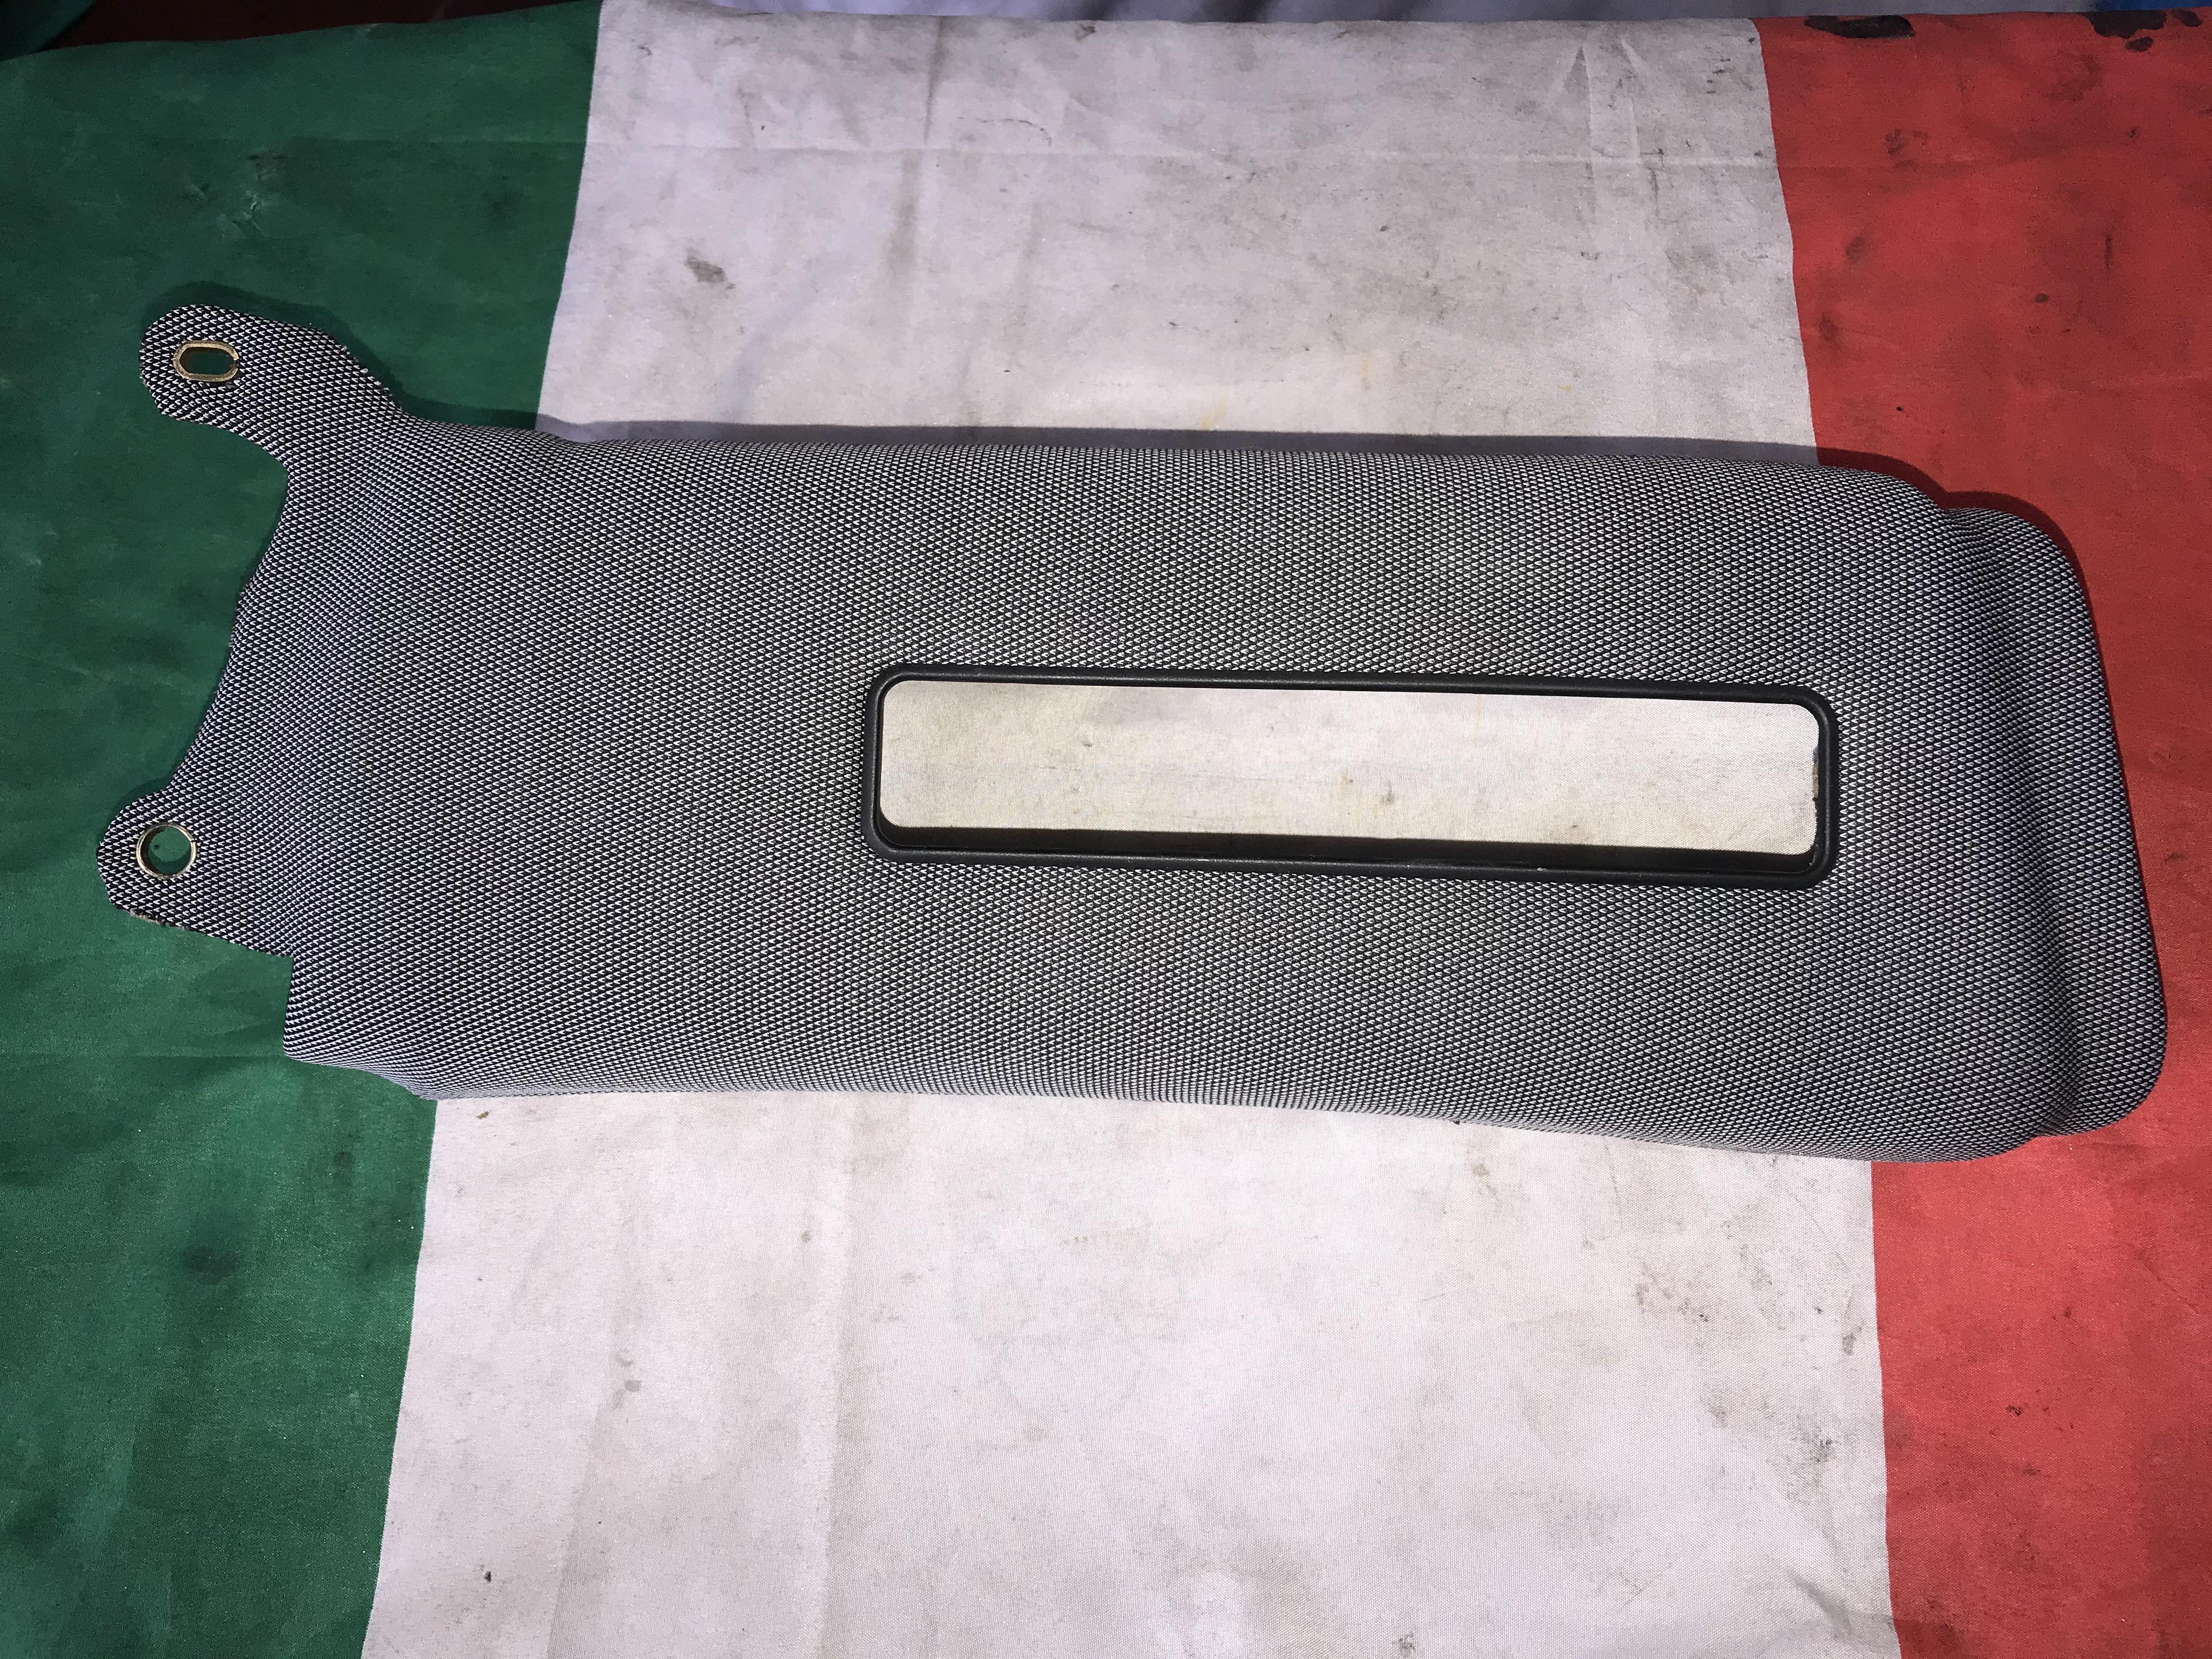 Alfa Romeo GTV 916 Limited Edition Cup B-pillar Cover Panel, Left Sx B-post